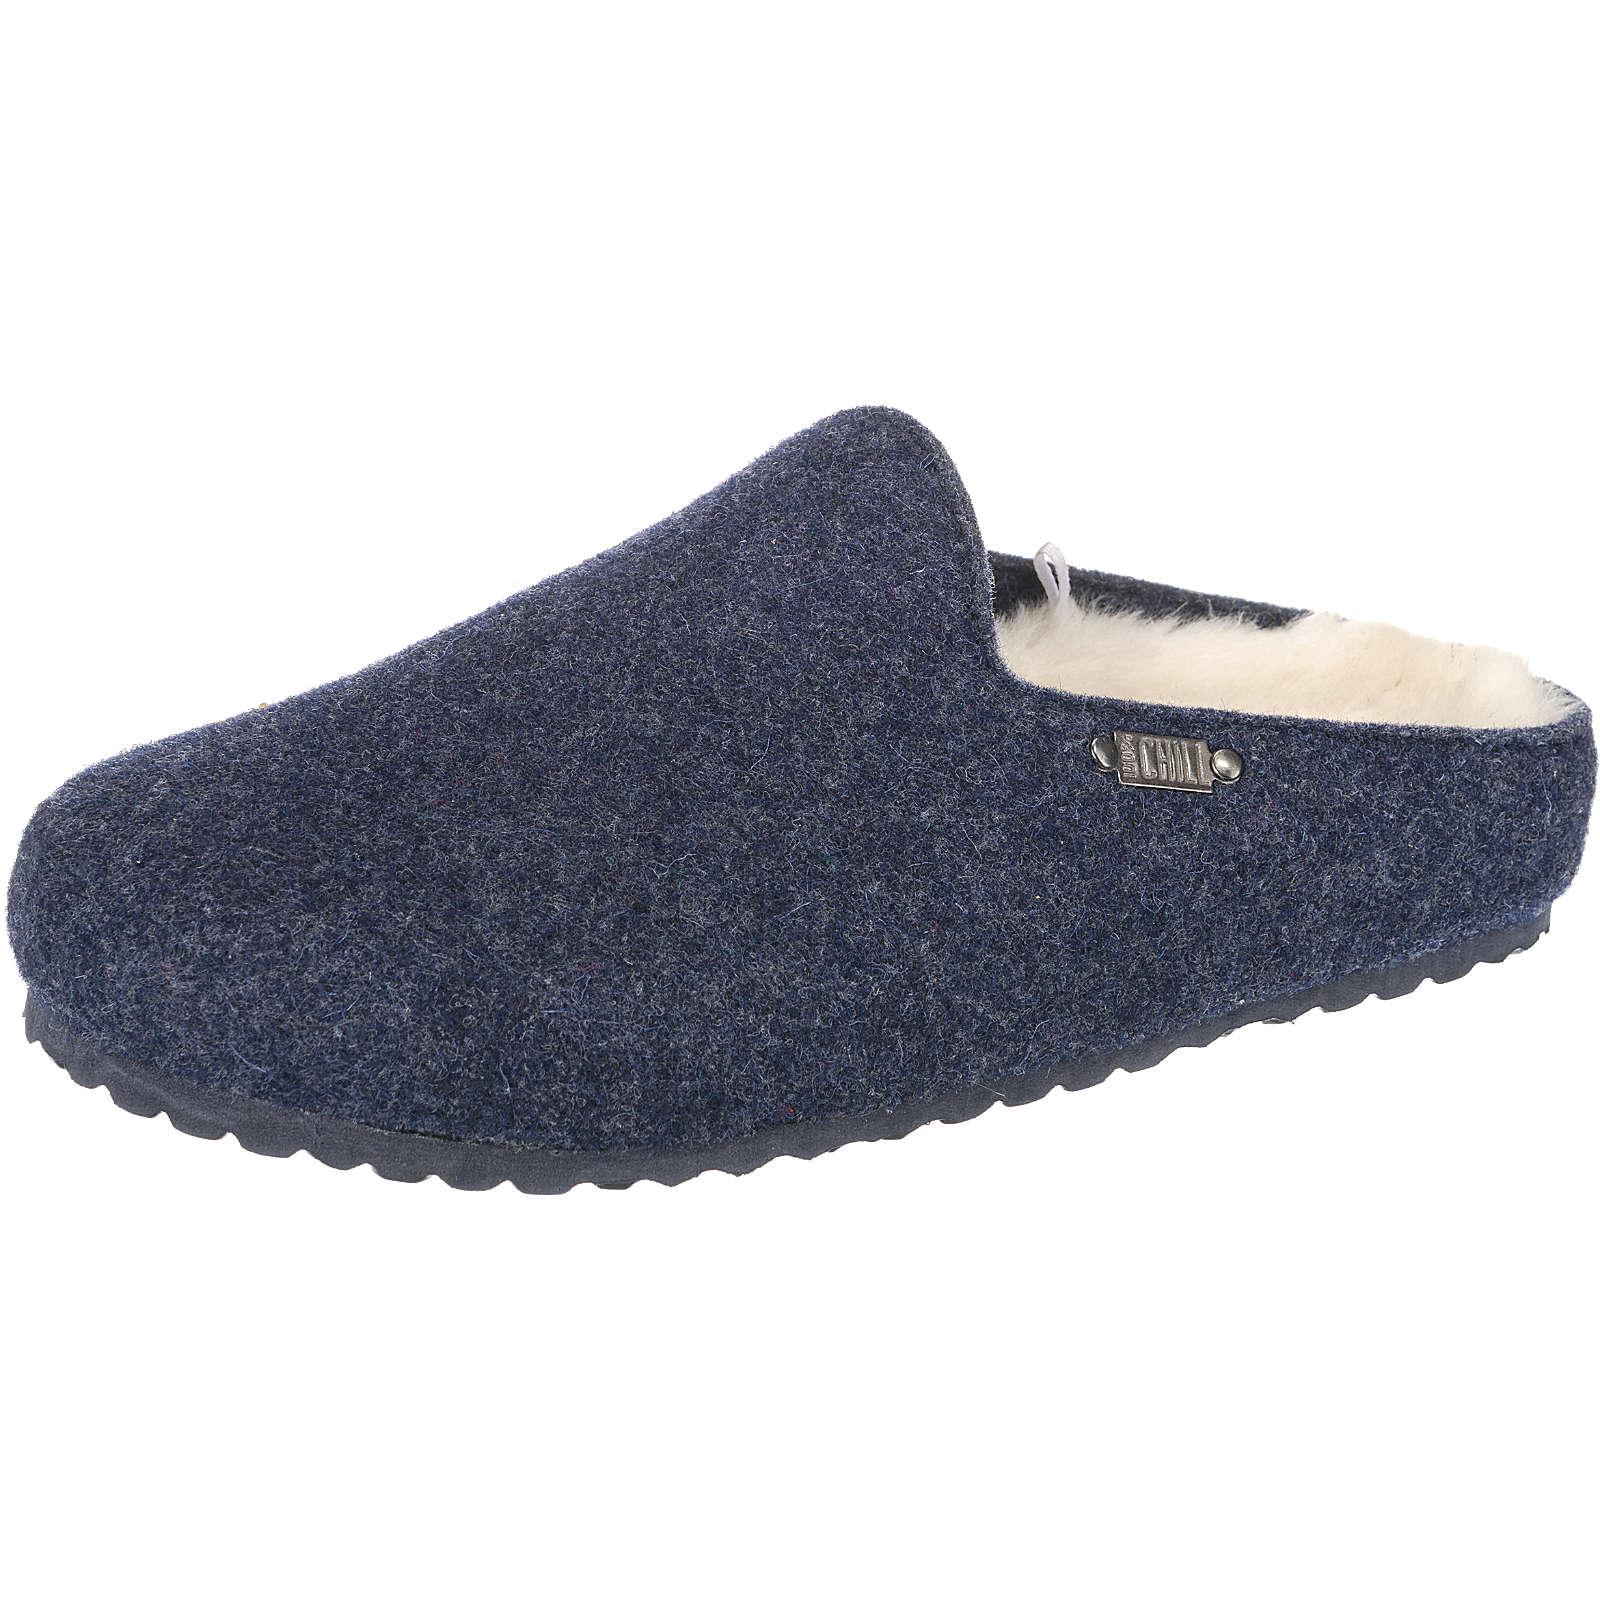 Jane Klain Pantoffeln blau Damen Gr. 39